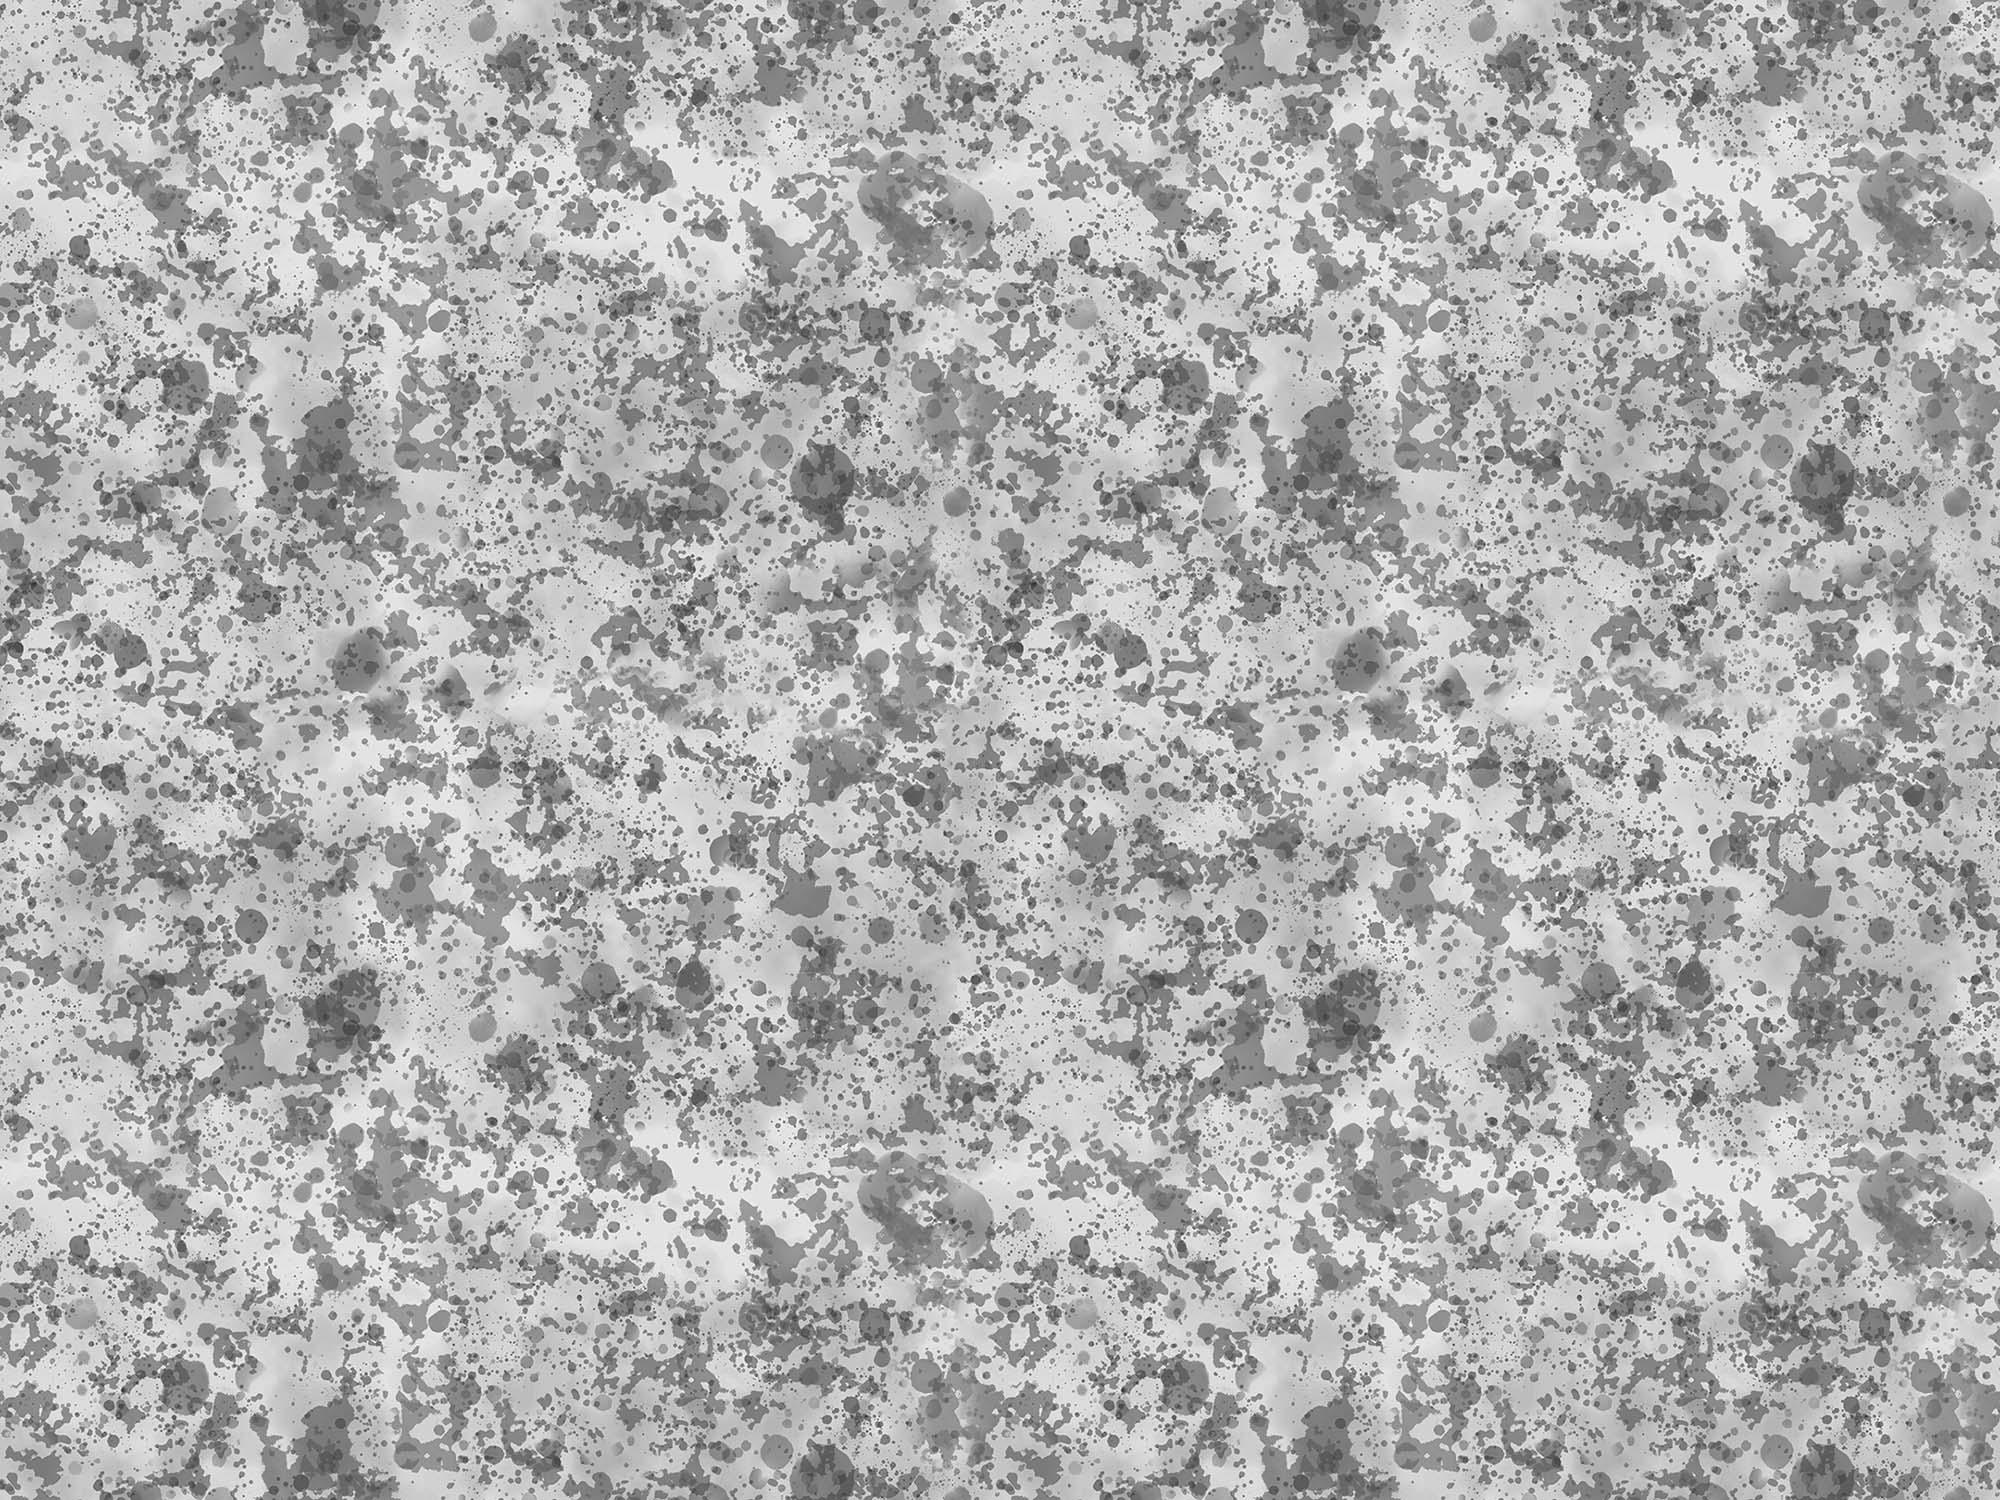 Seamless Dust Texture 3